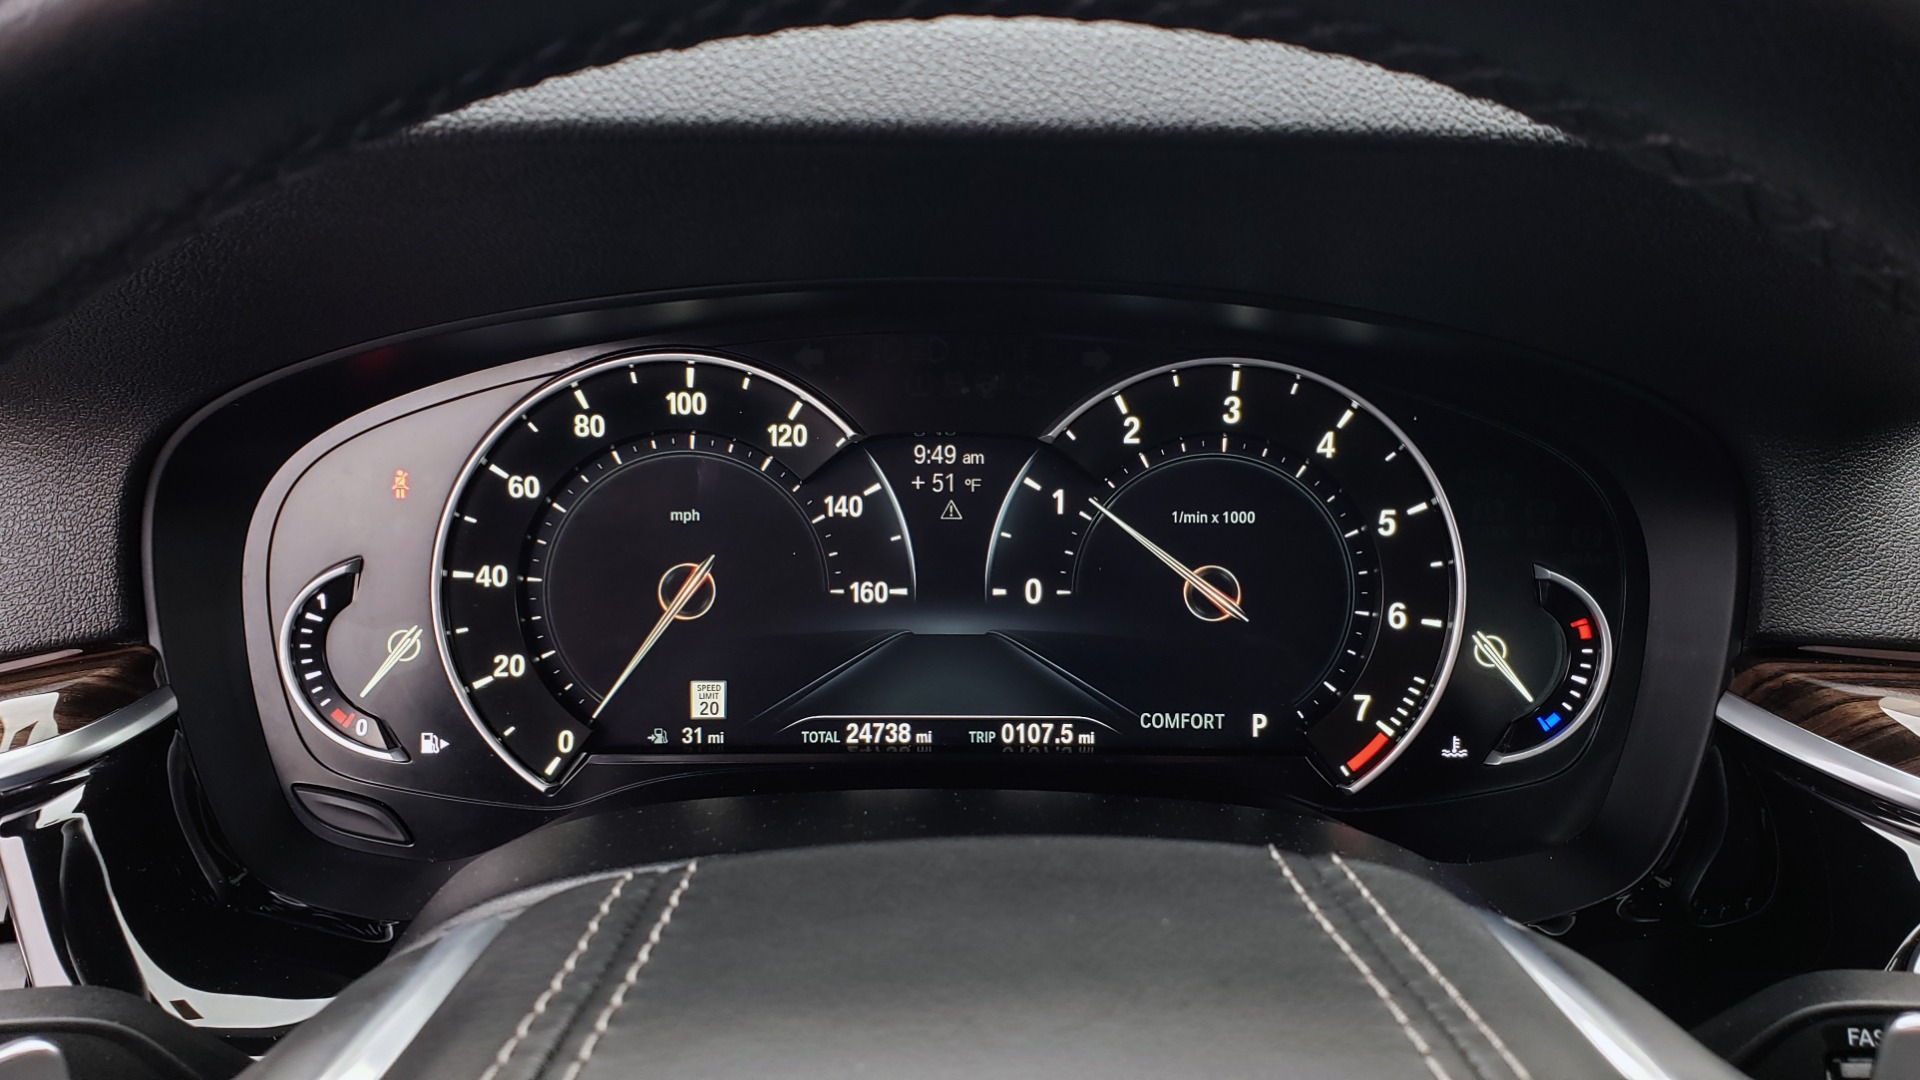 Used 2017 BMW 5 SERIES 530IXDRIVE / PREM PKG / DRVR ASST PLUS / CLD WTHR / APPLE CARPLAY for sale $30,595 at Formula Imports in Charlotte NC 28227 40